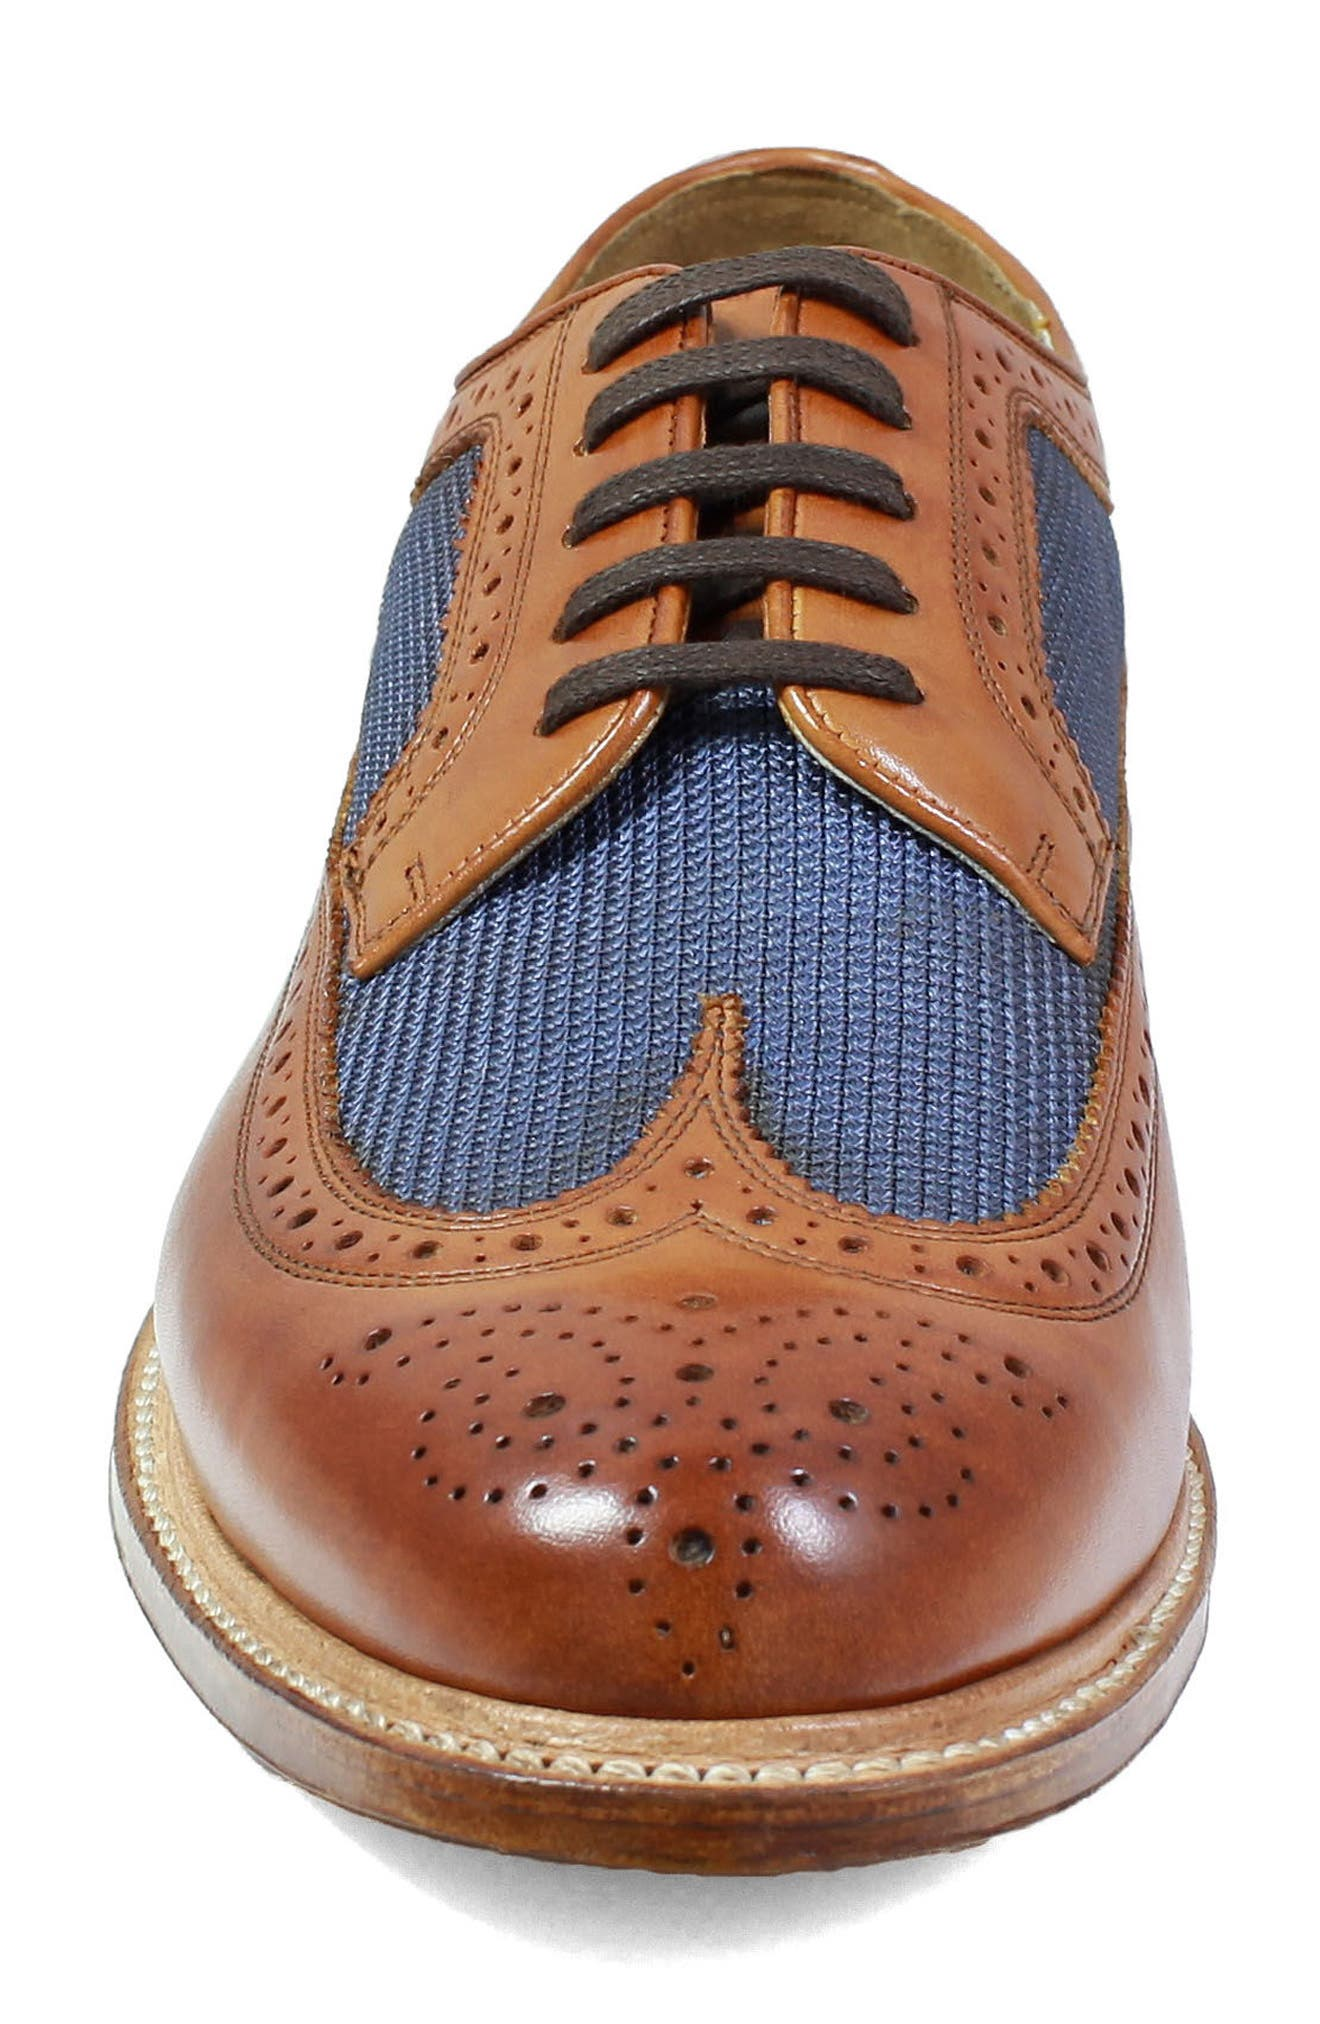 'Heritage' Wingtip,                             Alternate thumbnail 4, color,                             Cognac Leather/ Mesh